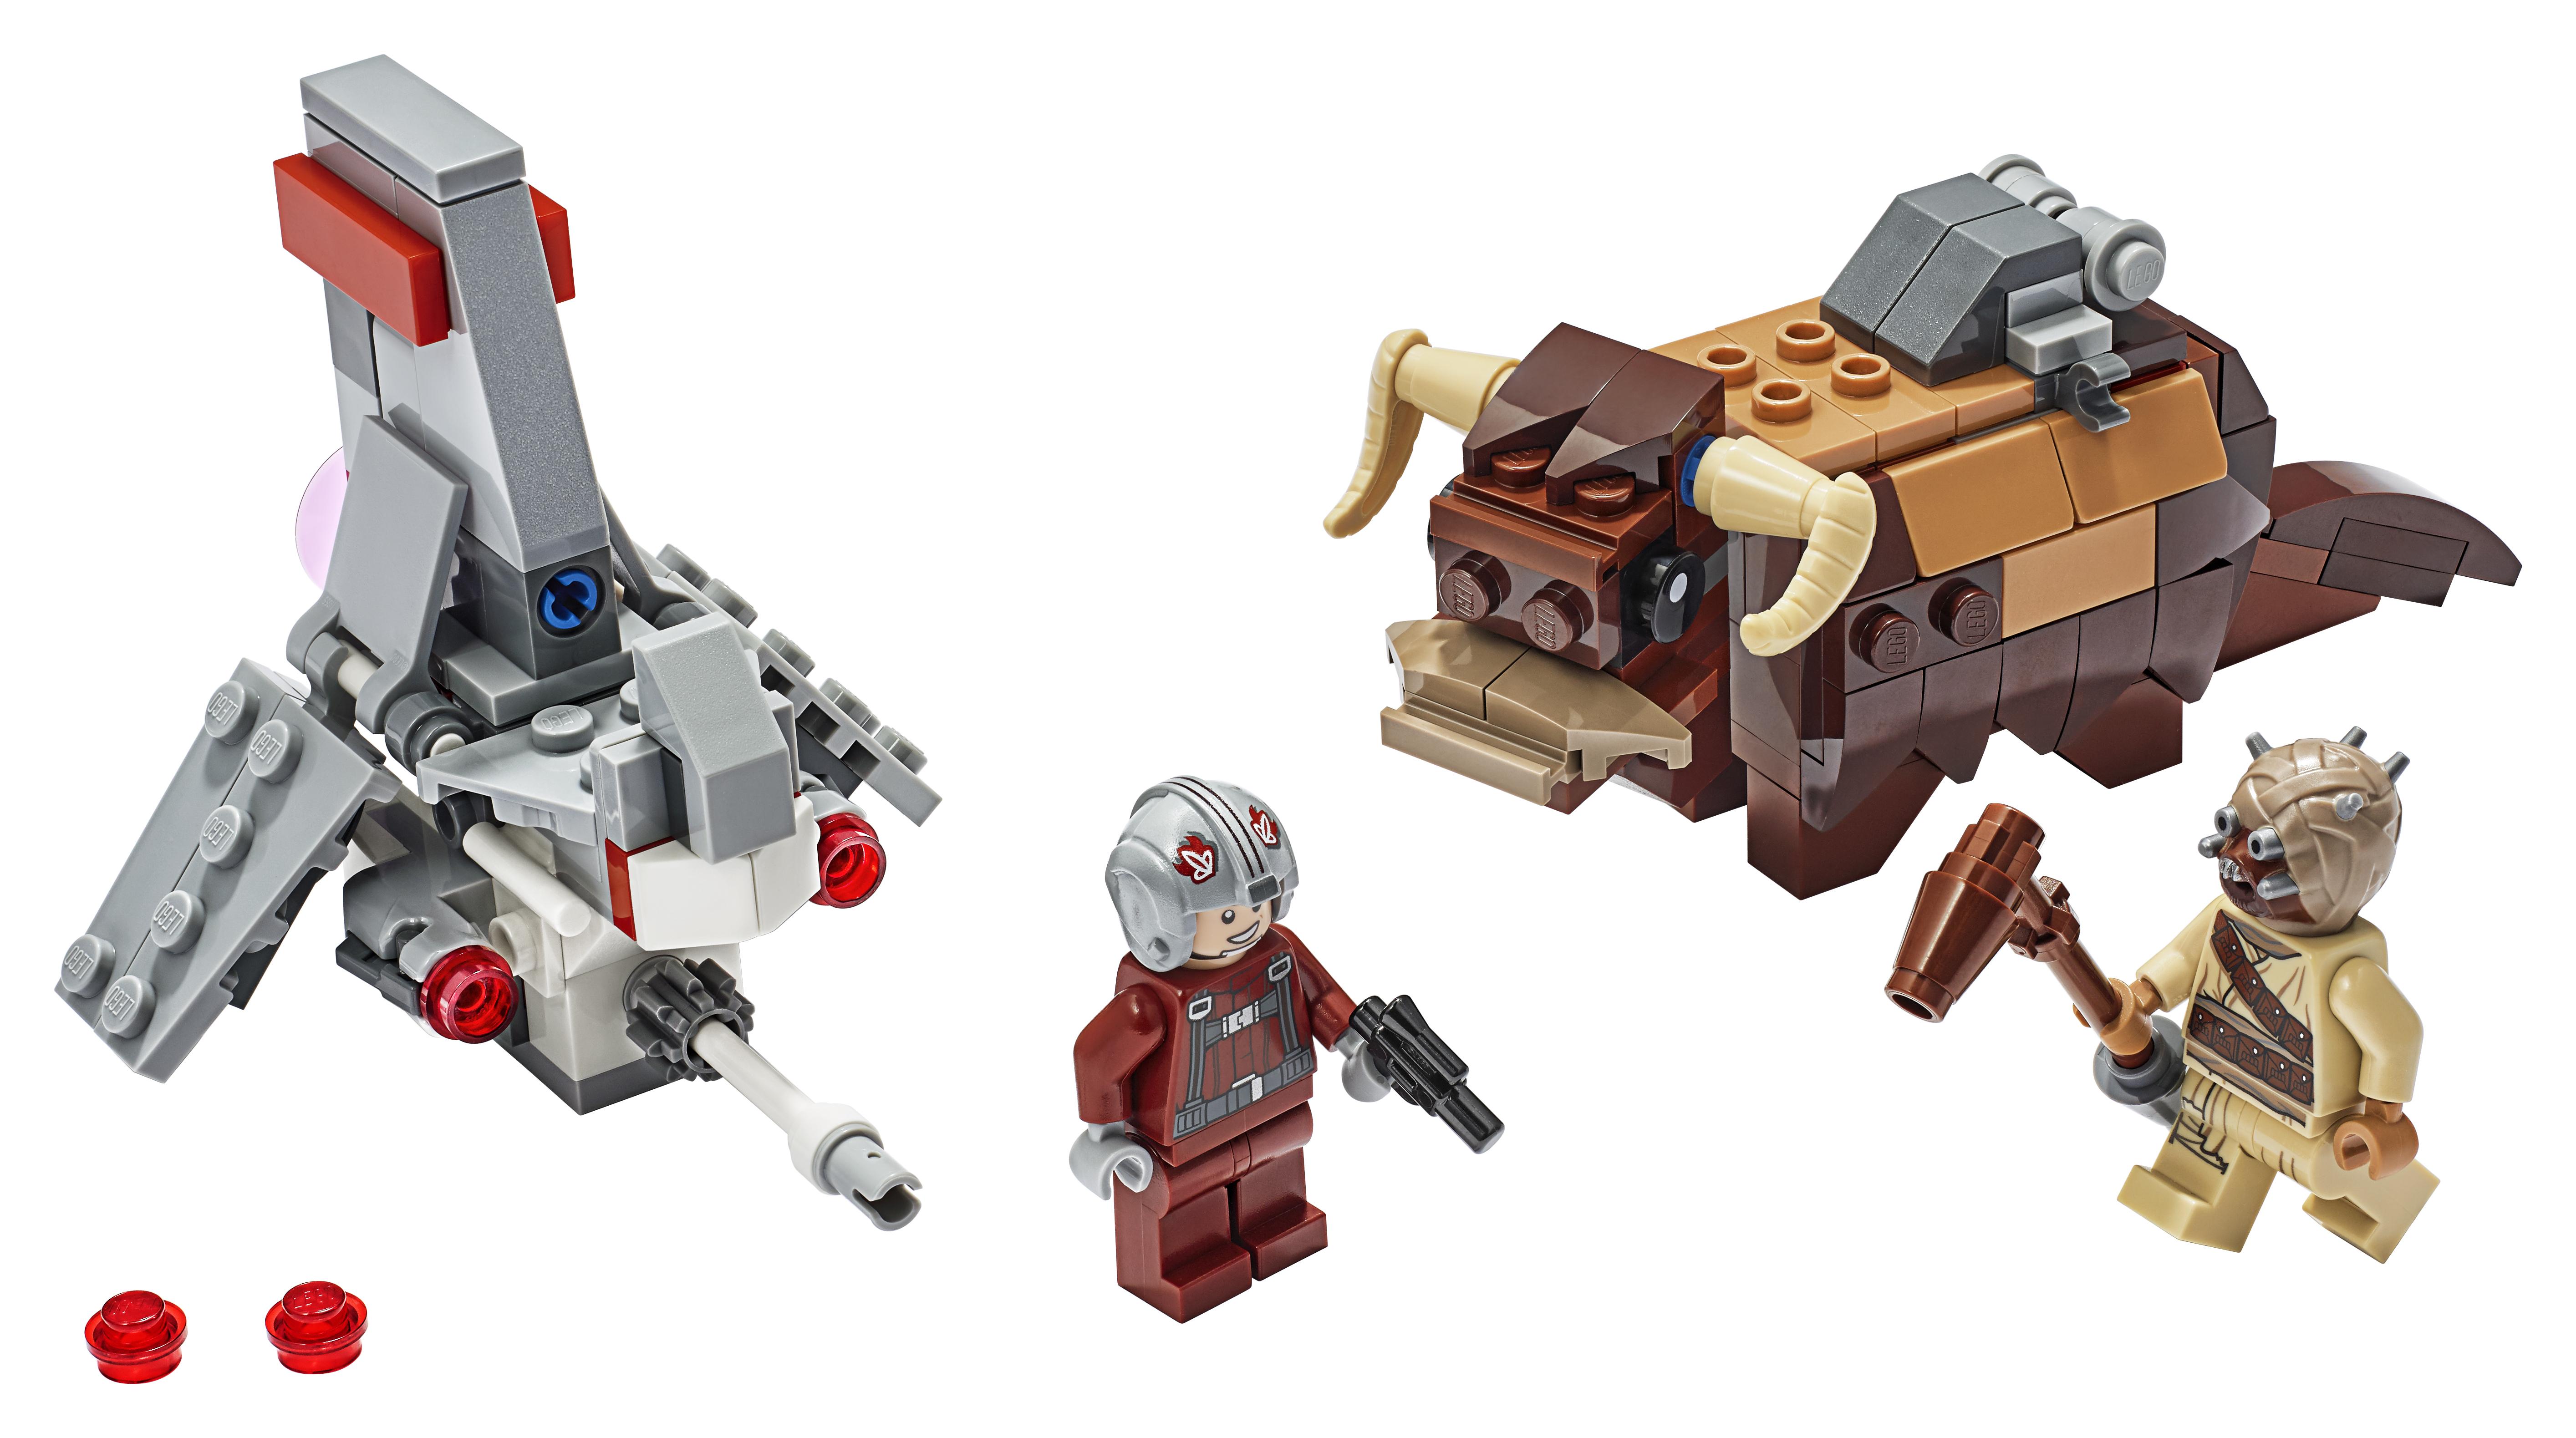 ANH T-16 Skyhopper vs Bantha Microfighters Lego set 3